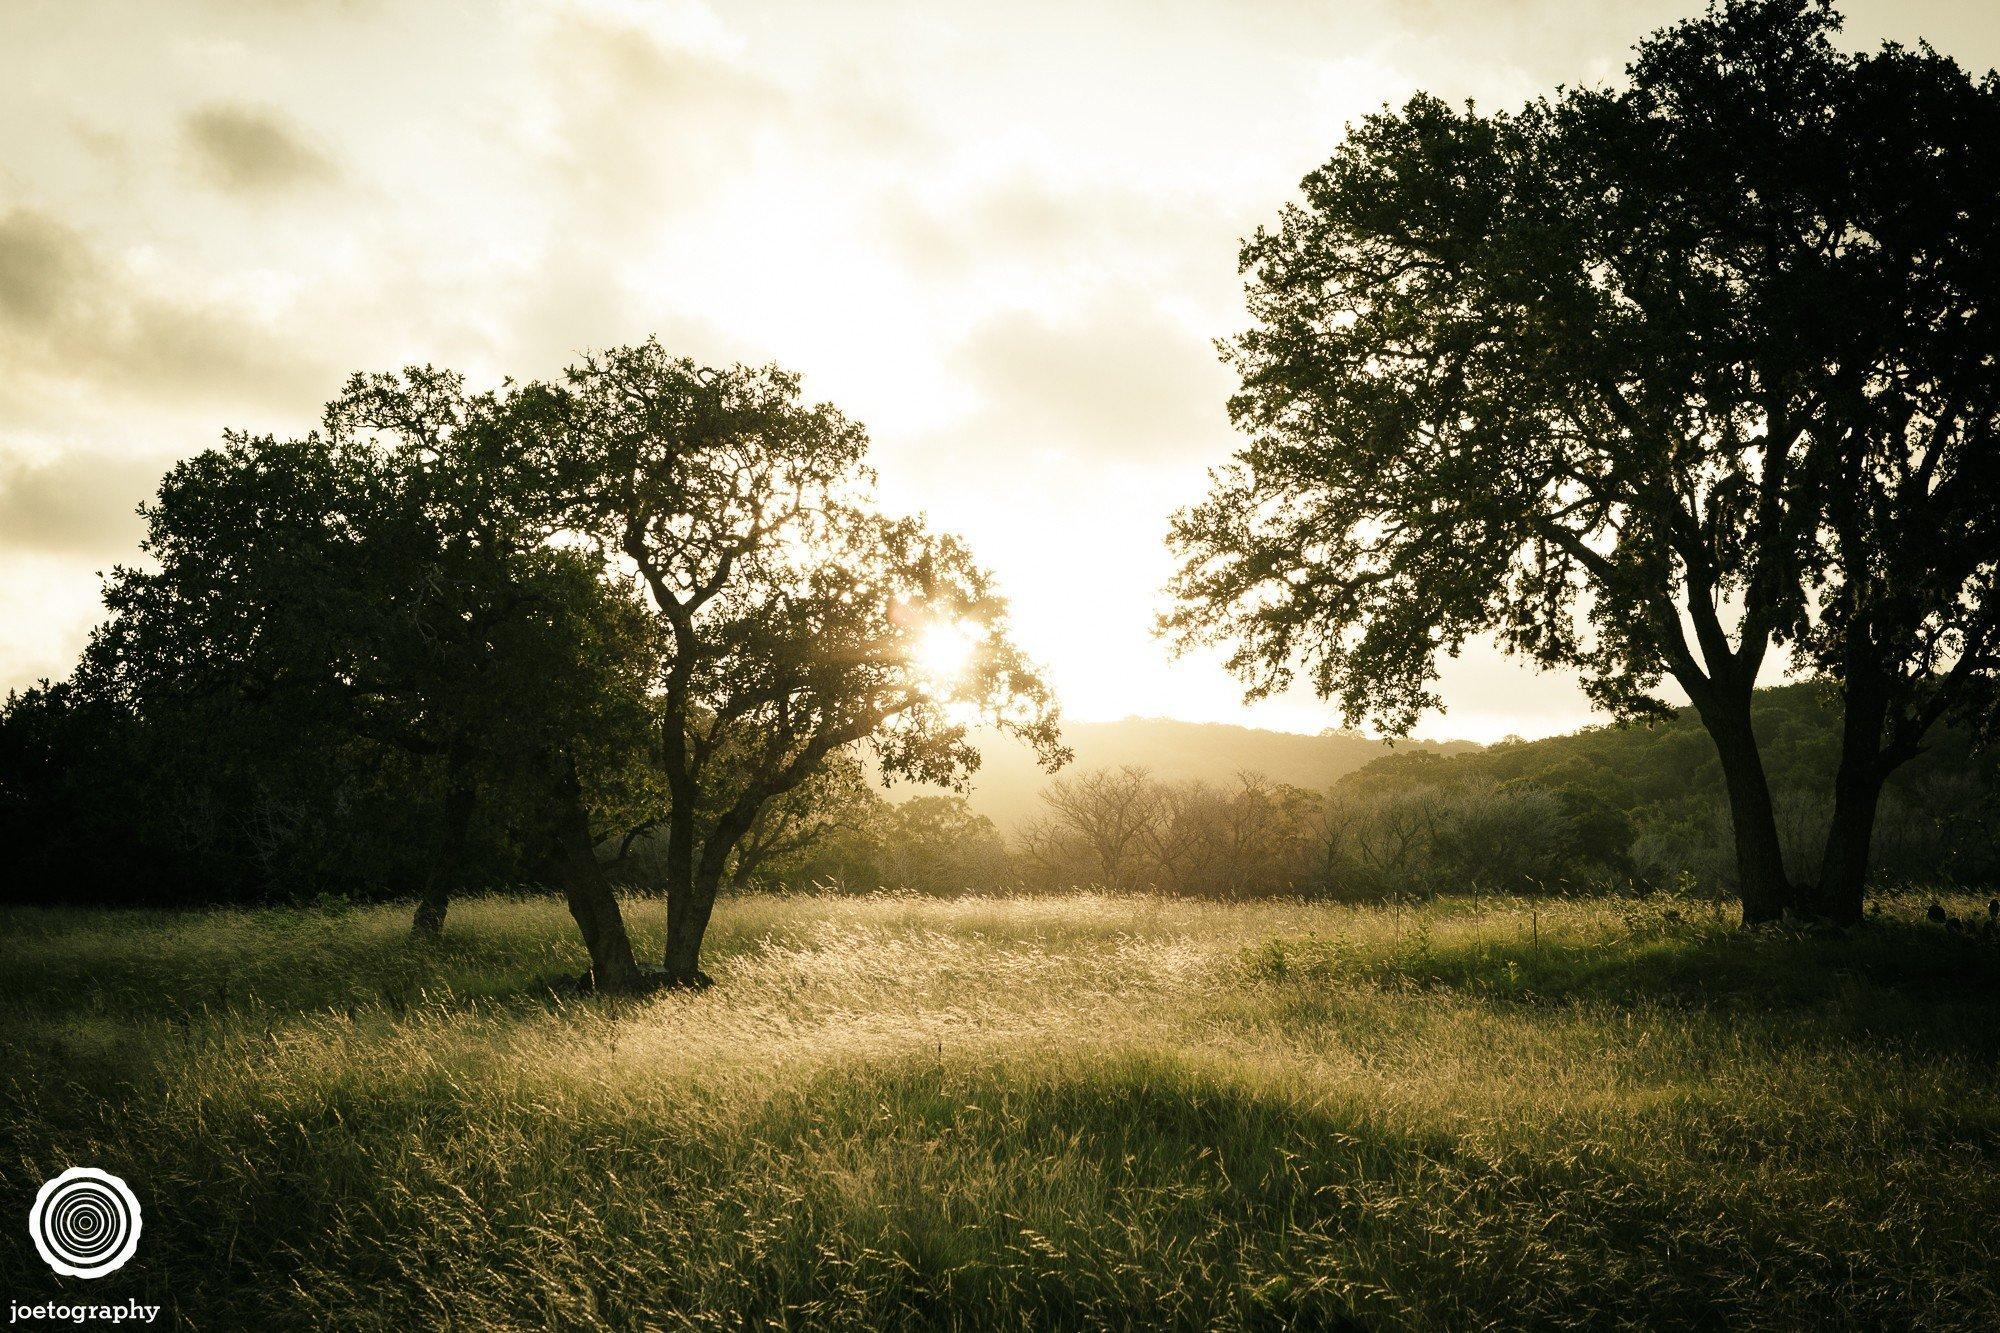 laity-lodge-san-antonio-texas-landscape-photographer-indianapolis-6